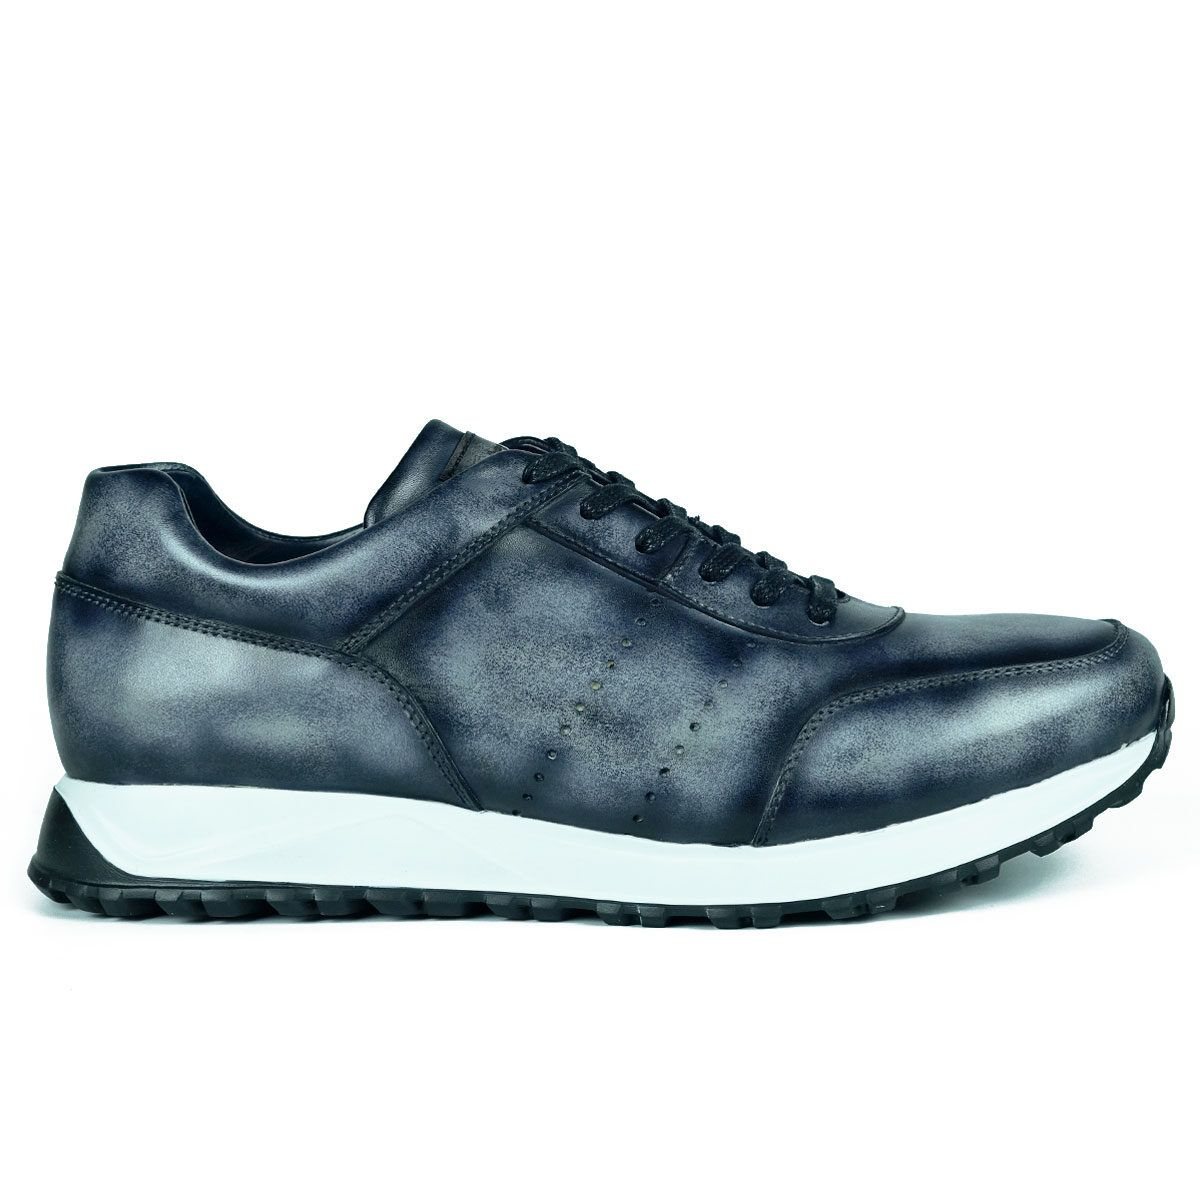 Mens Grey Sneakers Shoes